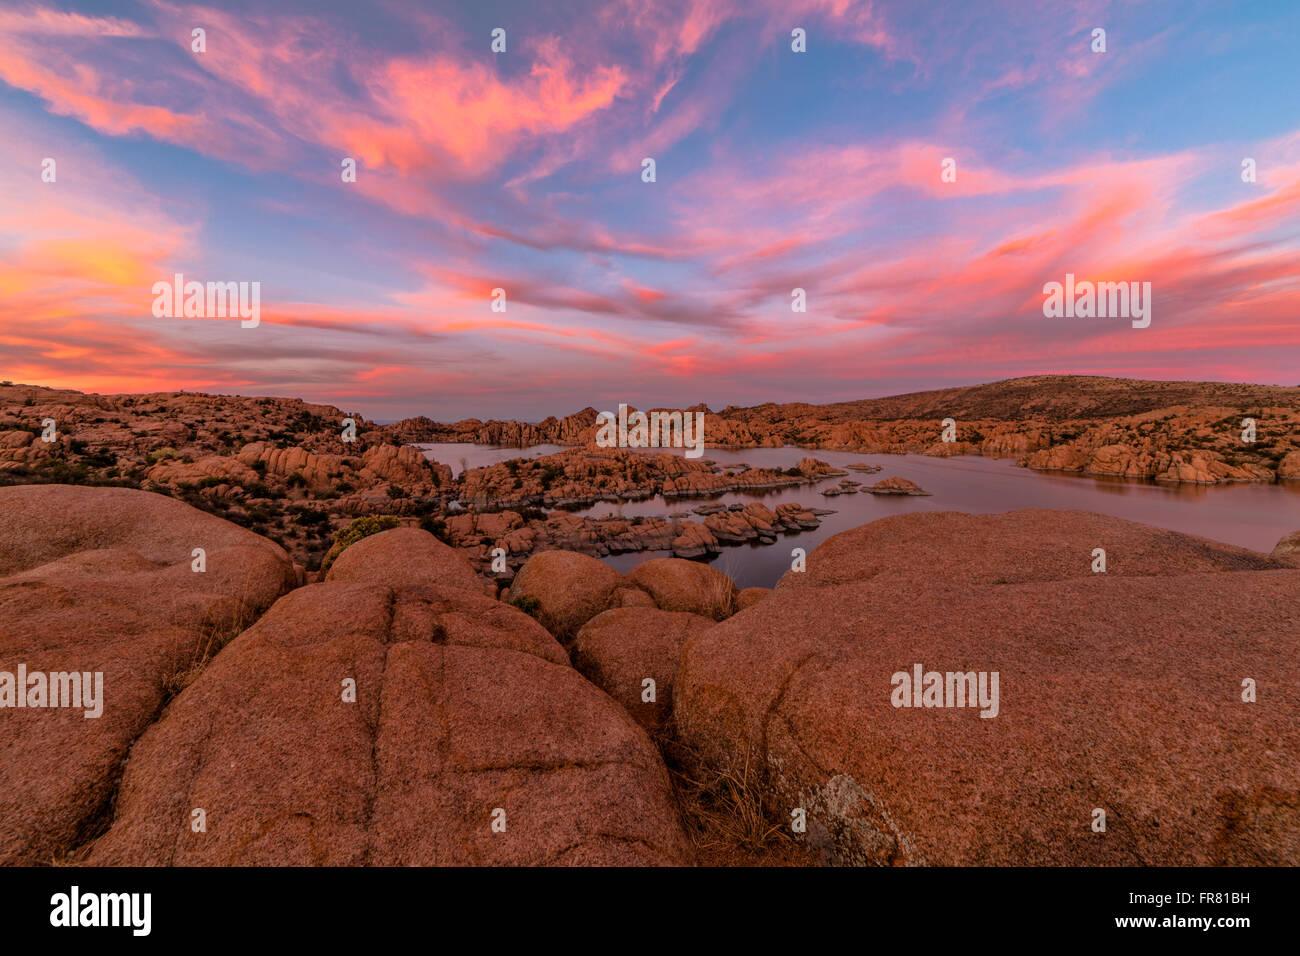 Schönen Sonnenuntergang über Watson Lake in Prescott, Arizona, USA. Stockbild